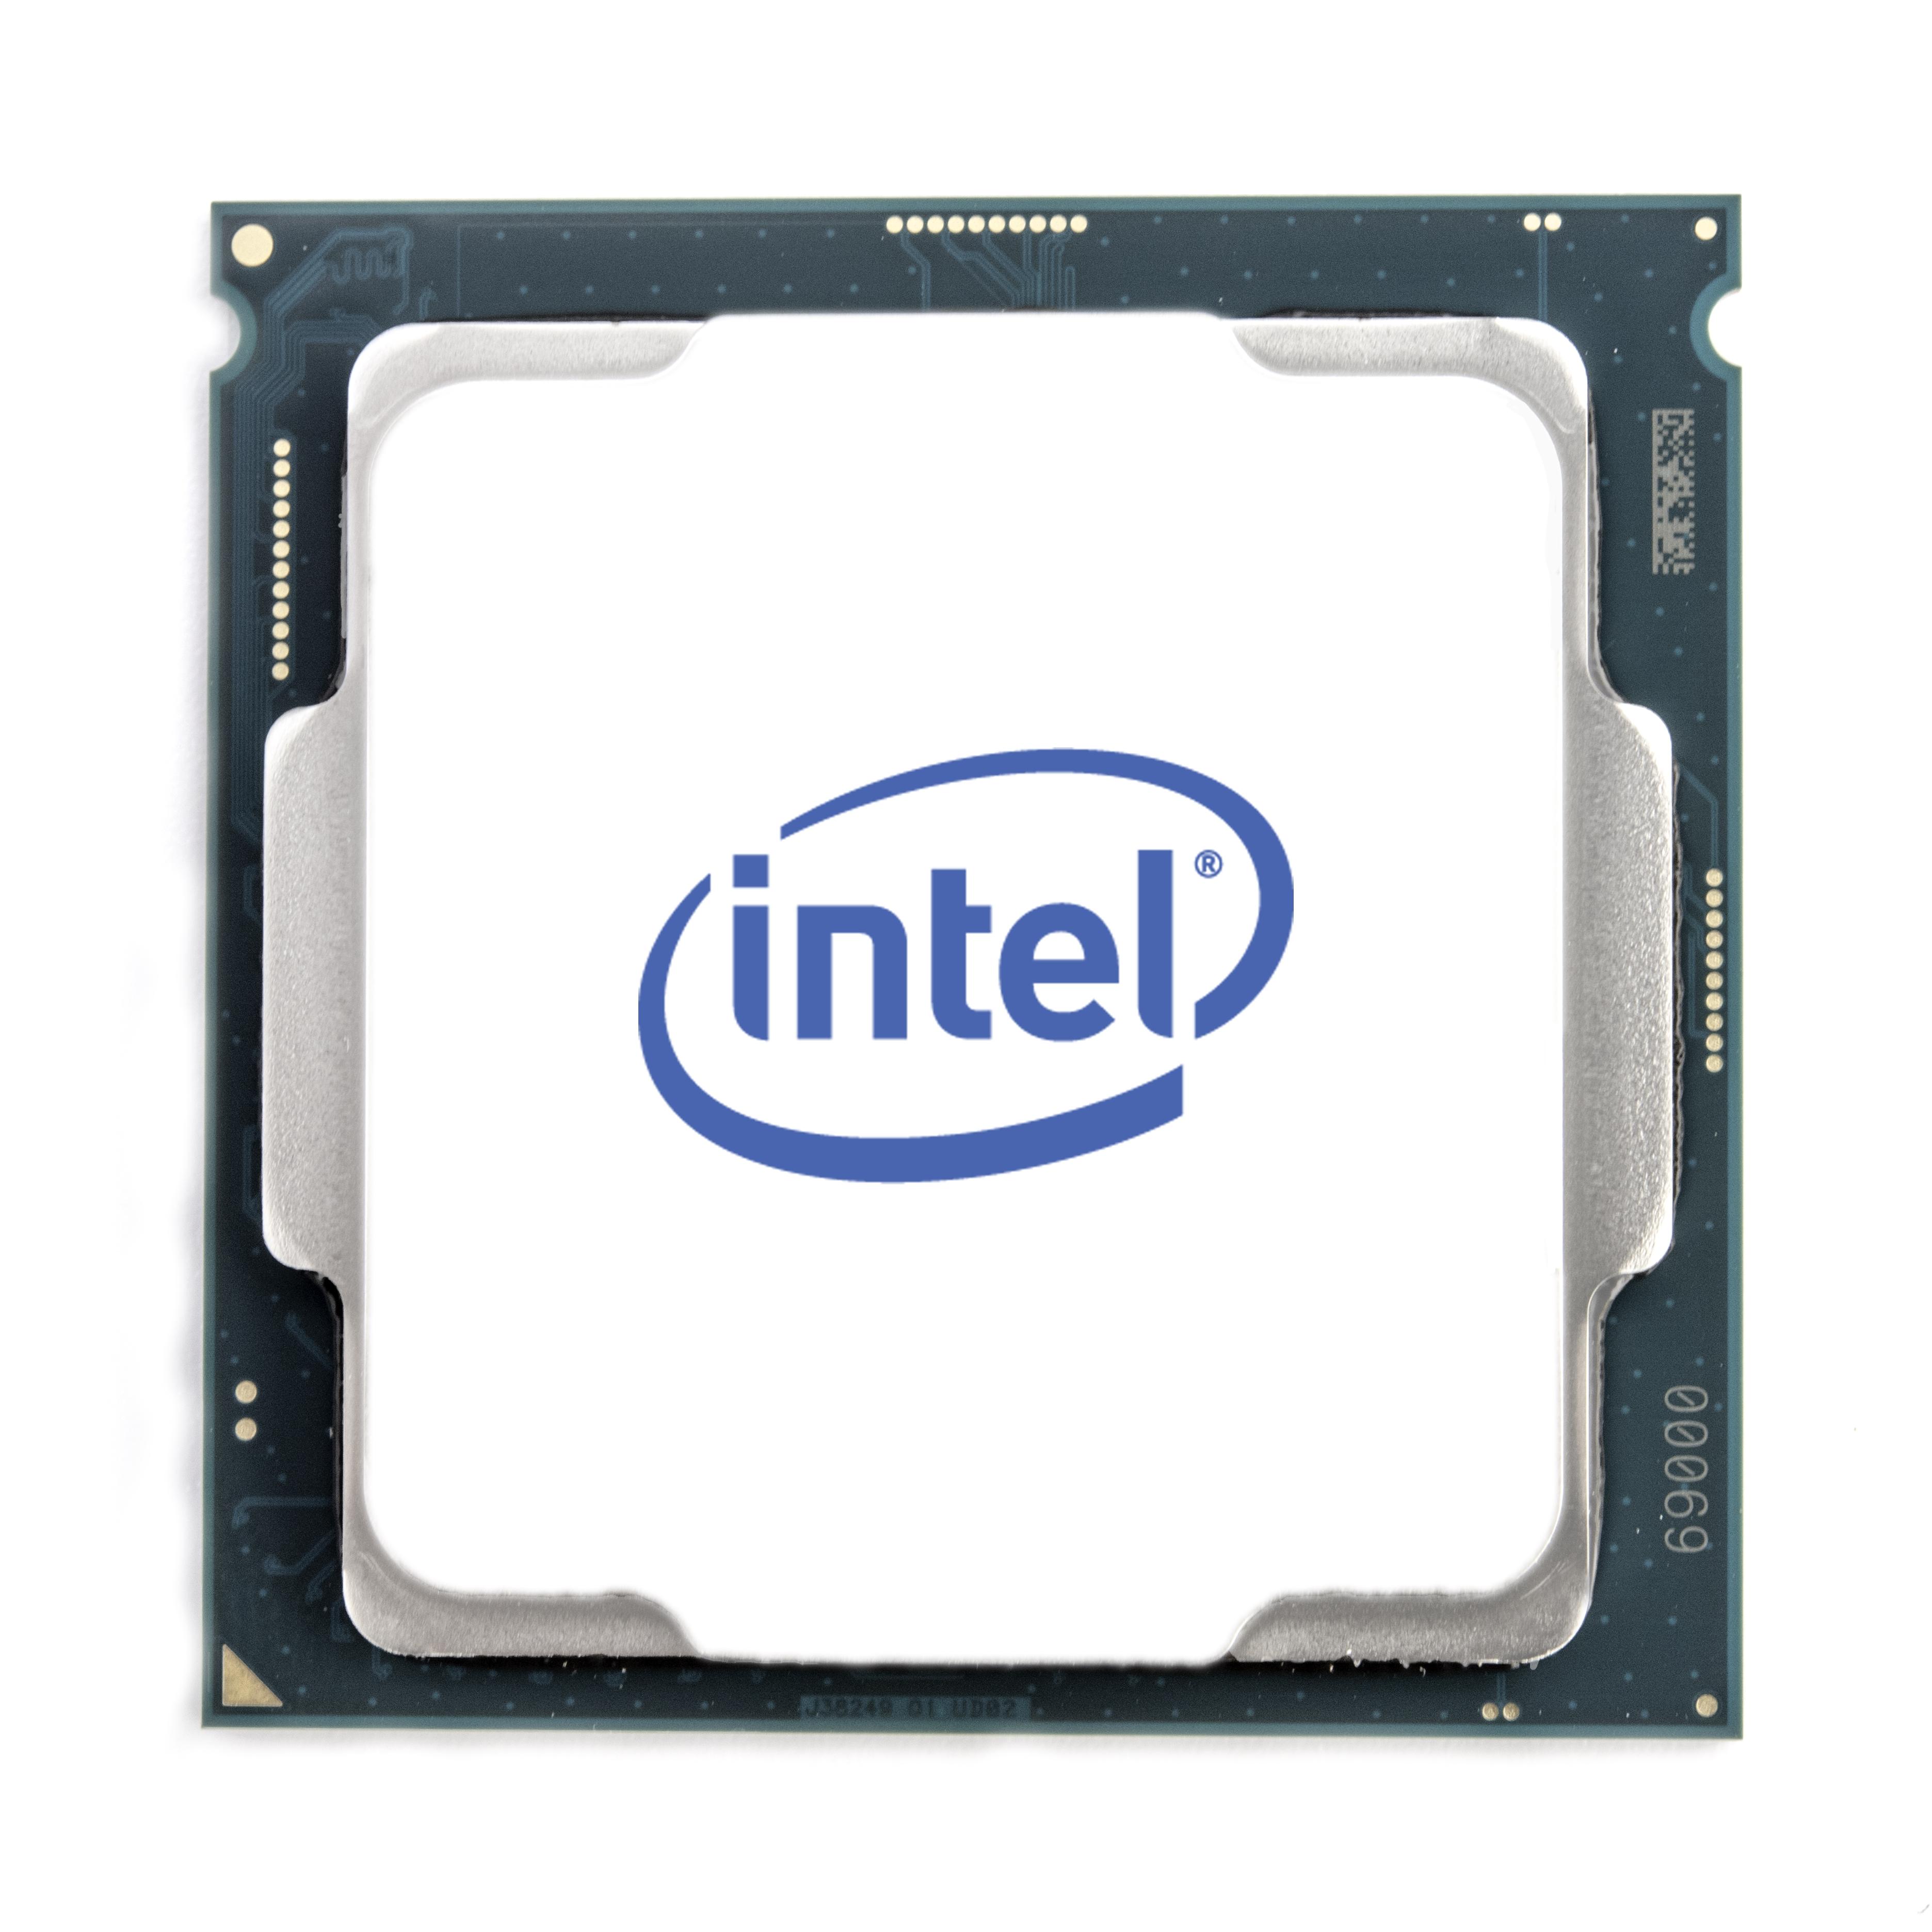 Socket 1200 : Celeron G5925, 3,6 GHz, 2 cores, 2 threads, 4 MB cache (box)